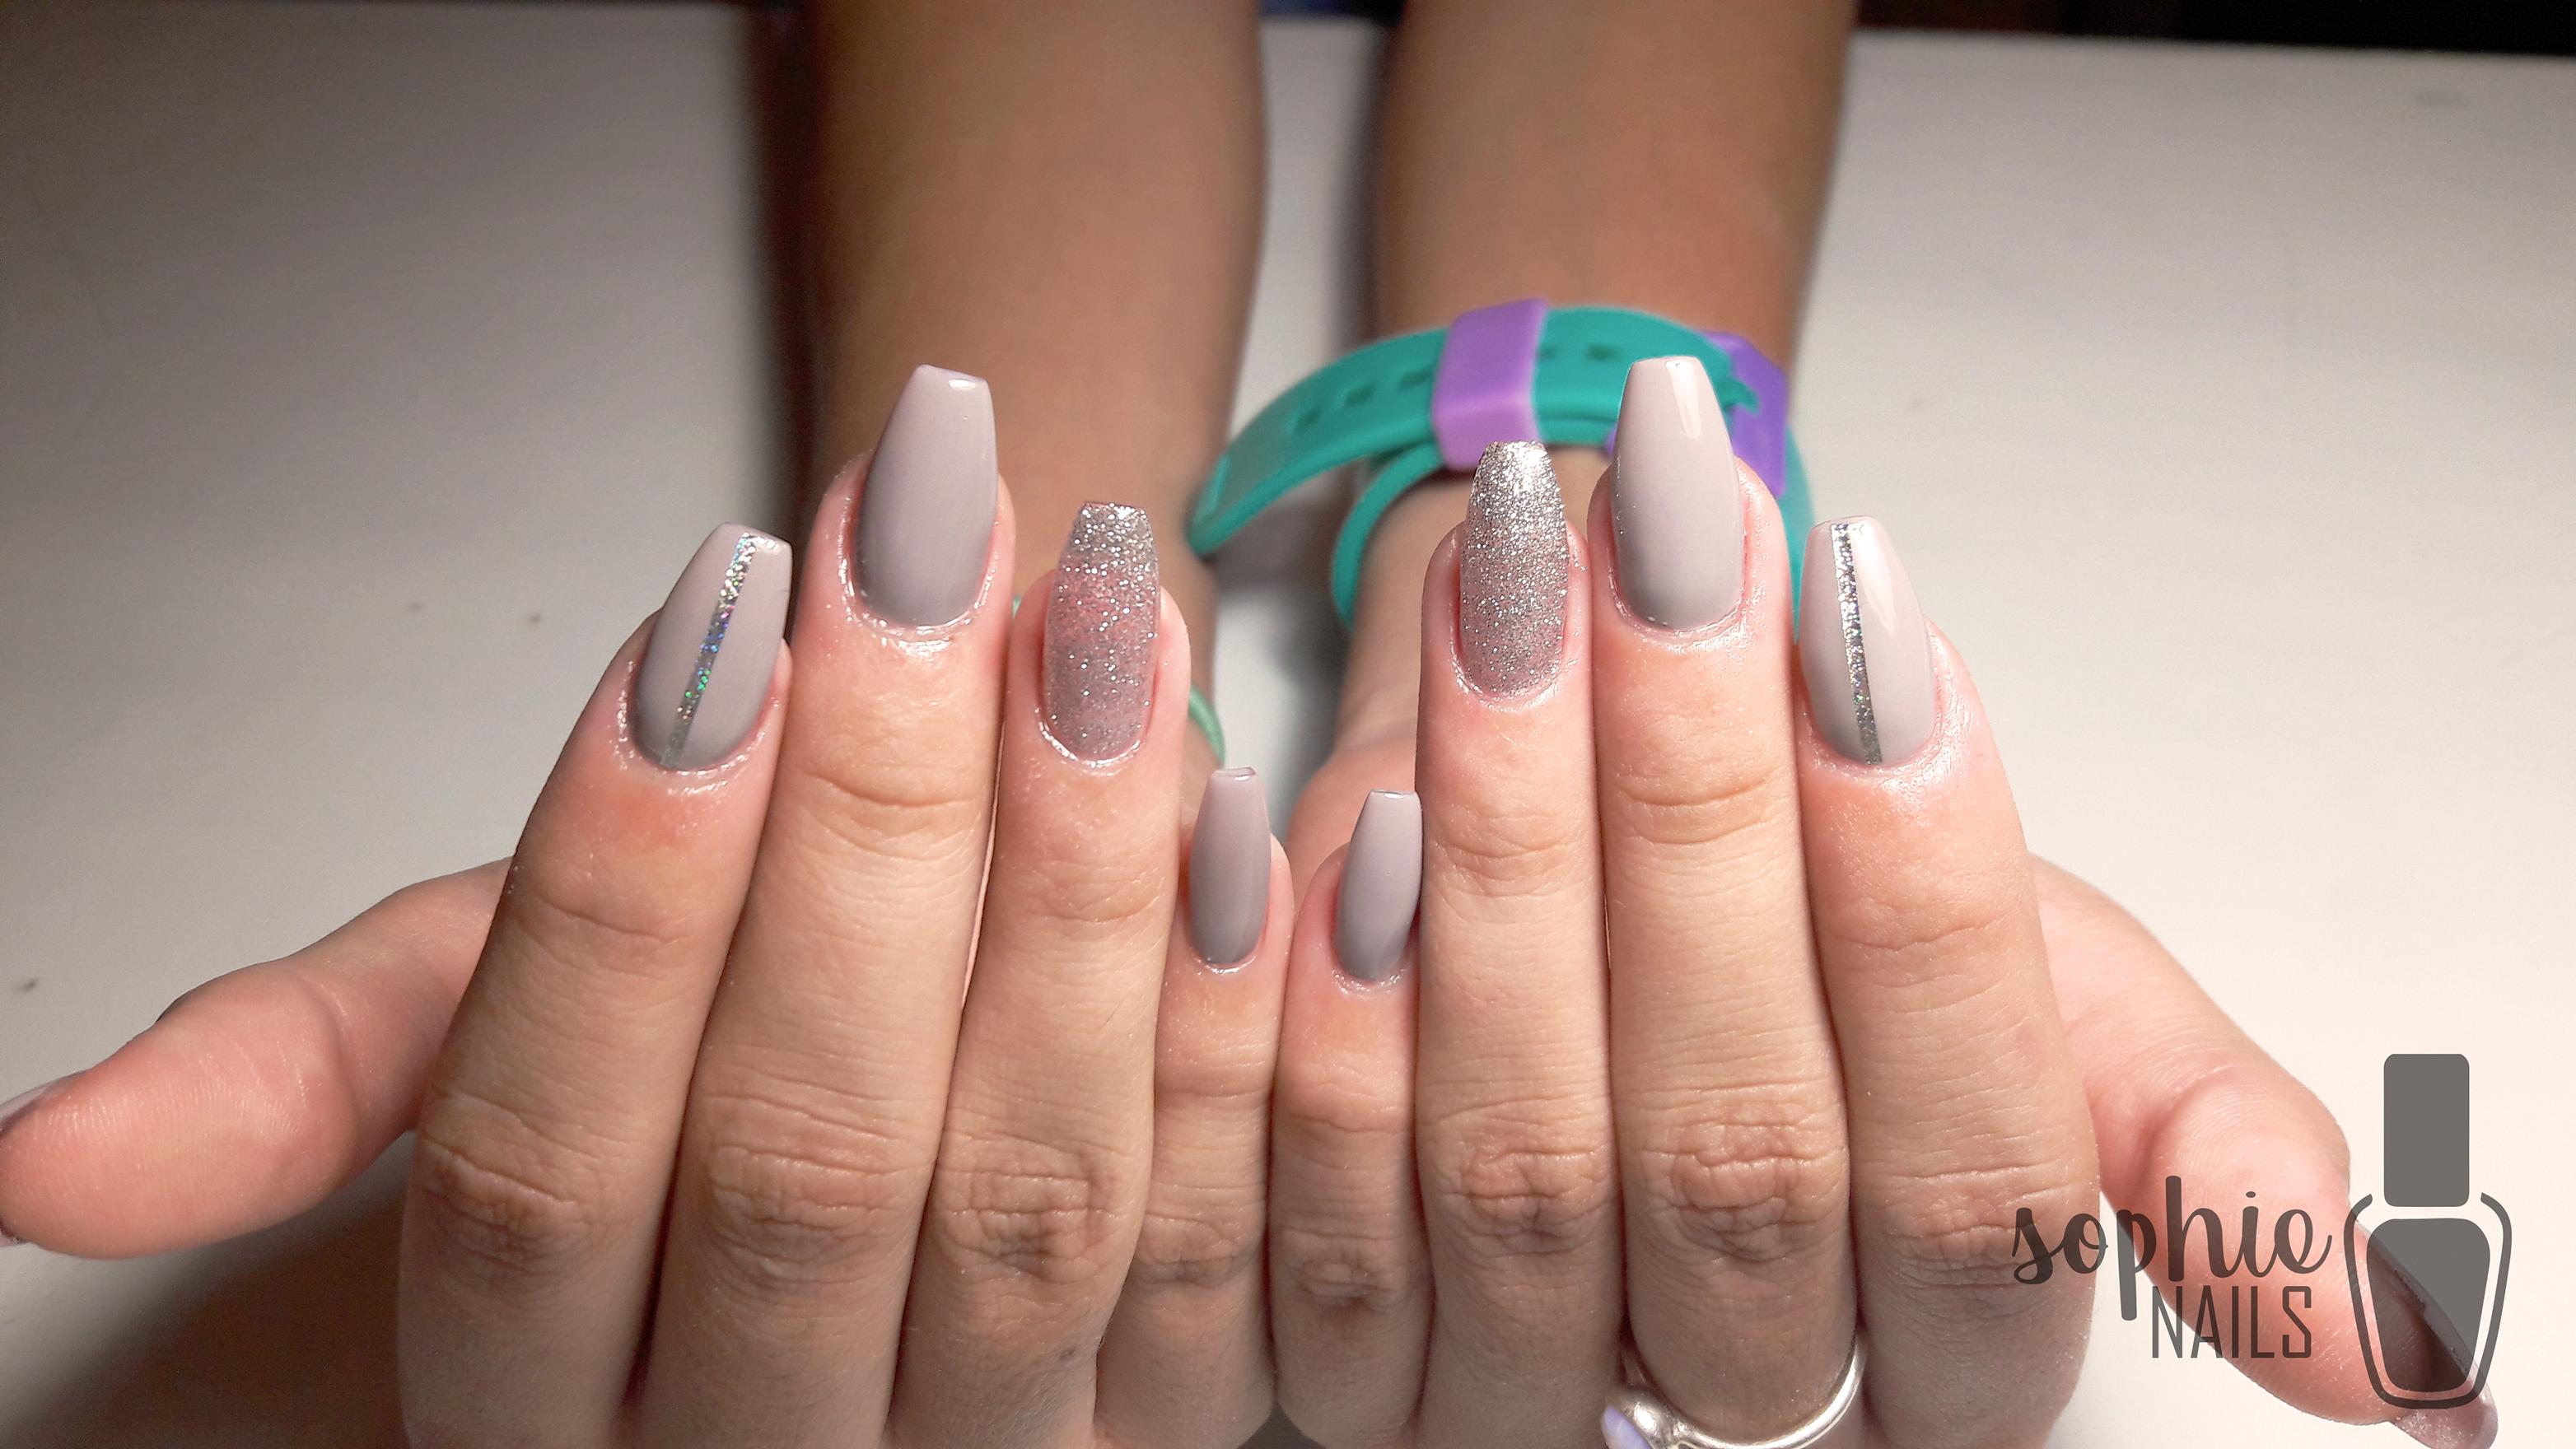 fashionnails #nailart # #style #elegant #gray #vintage #sophienails ...